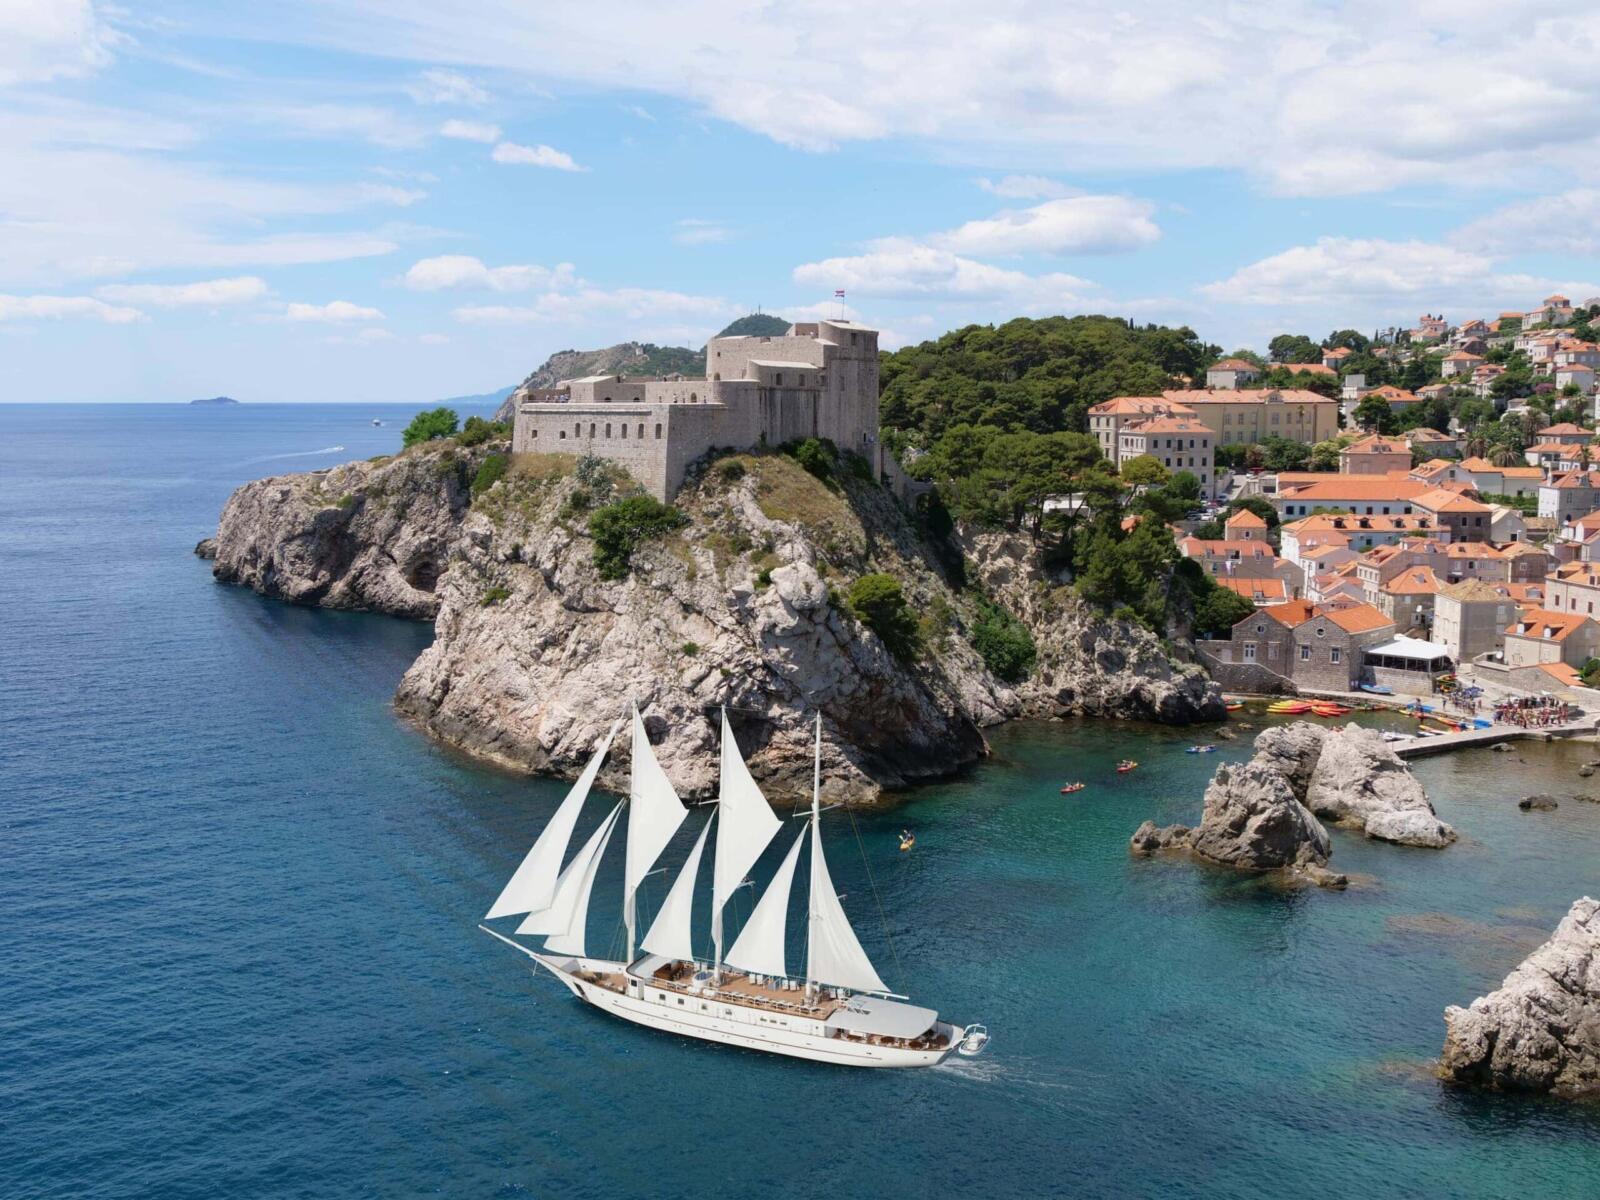 Many options for choosing a luxury cruise in Croatia